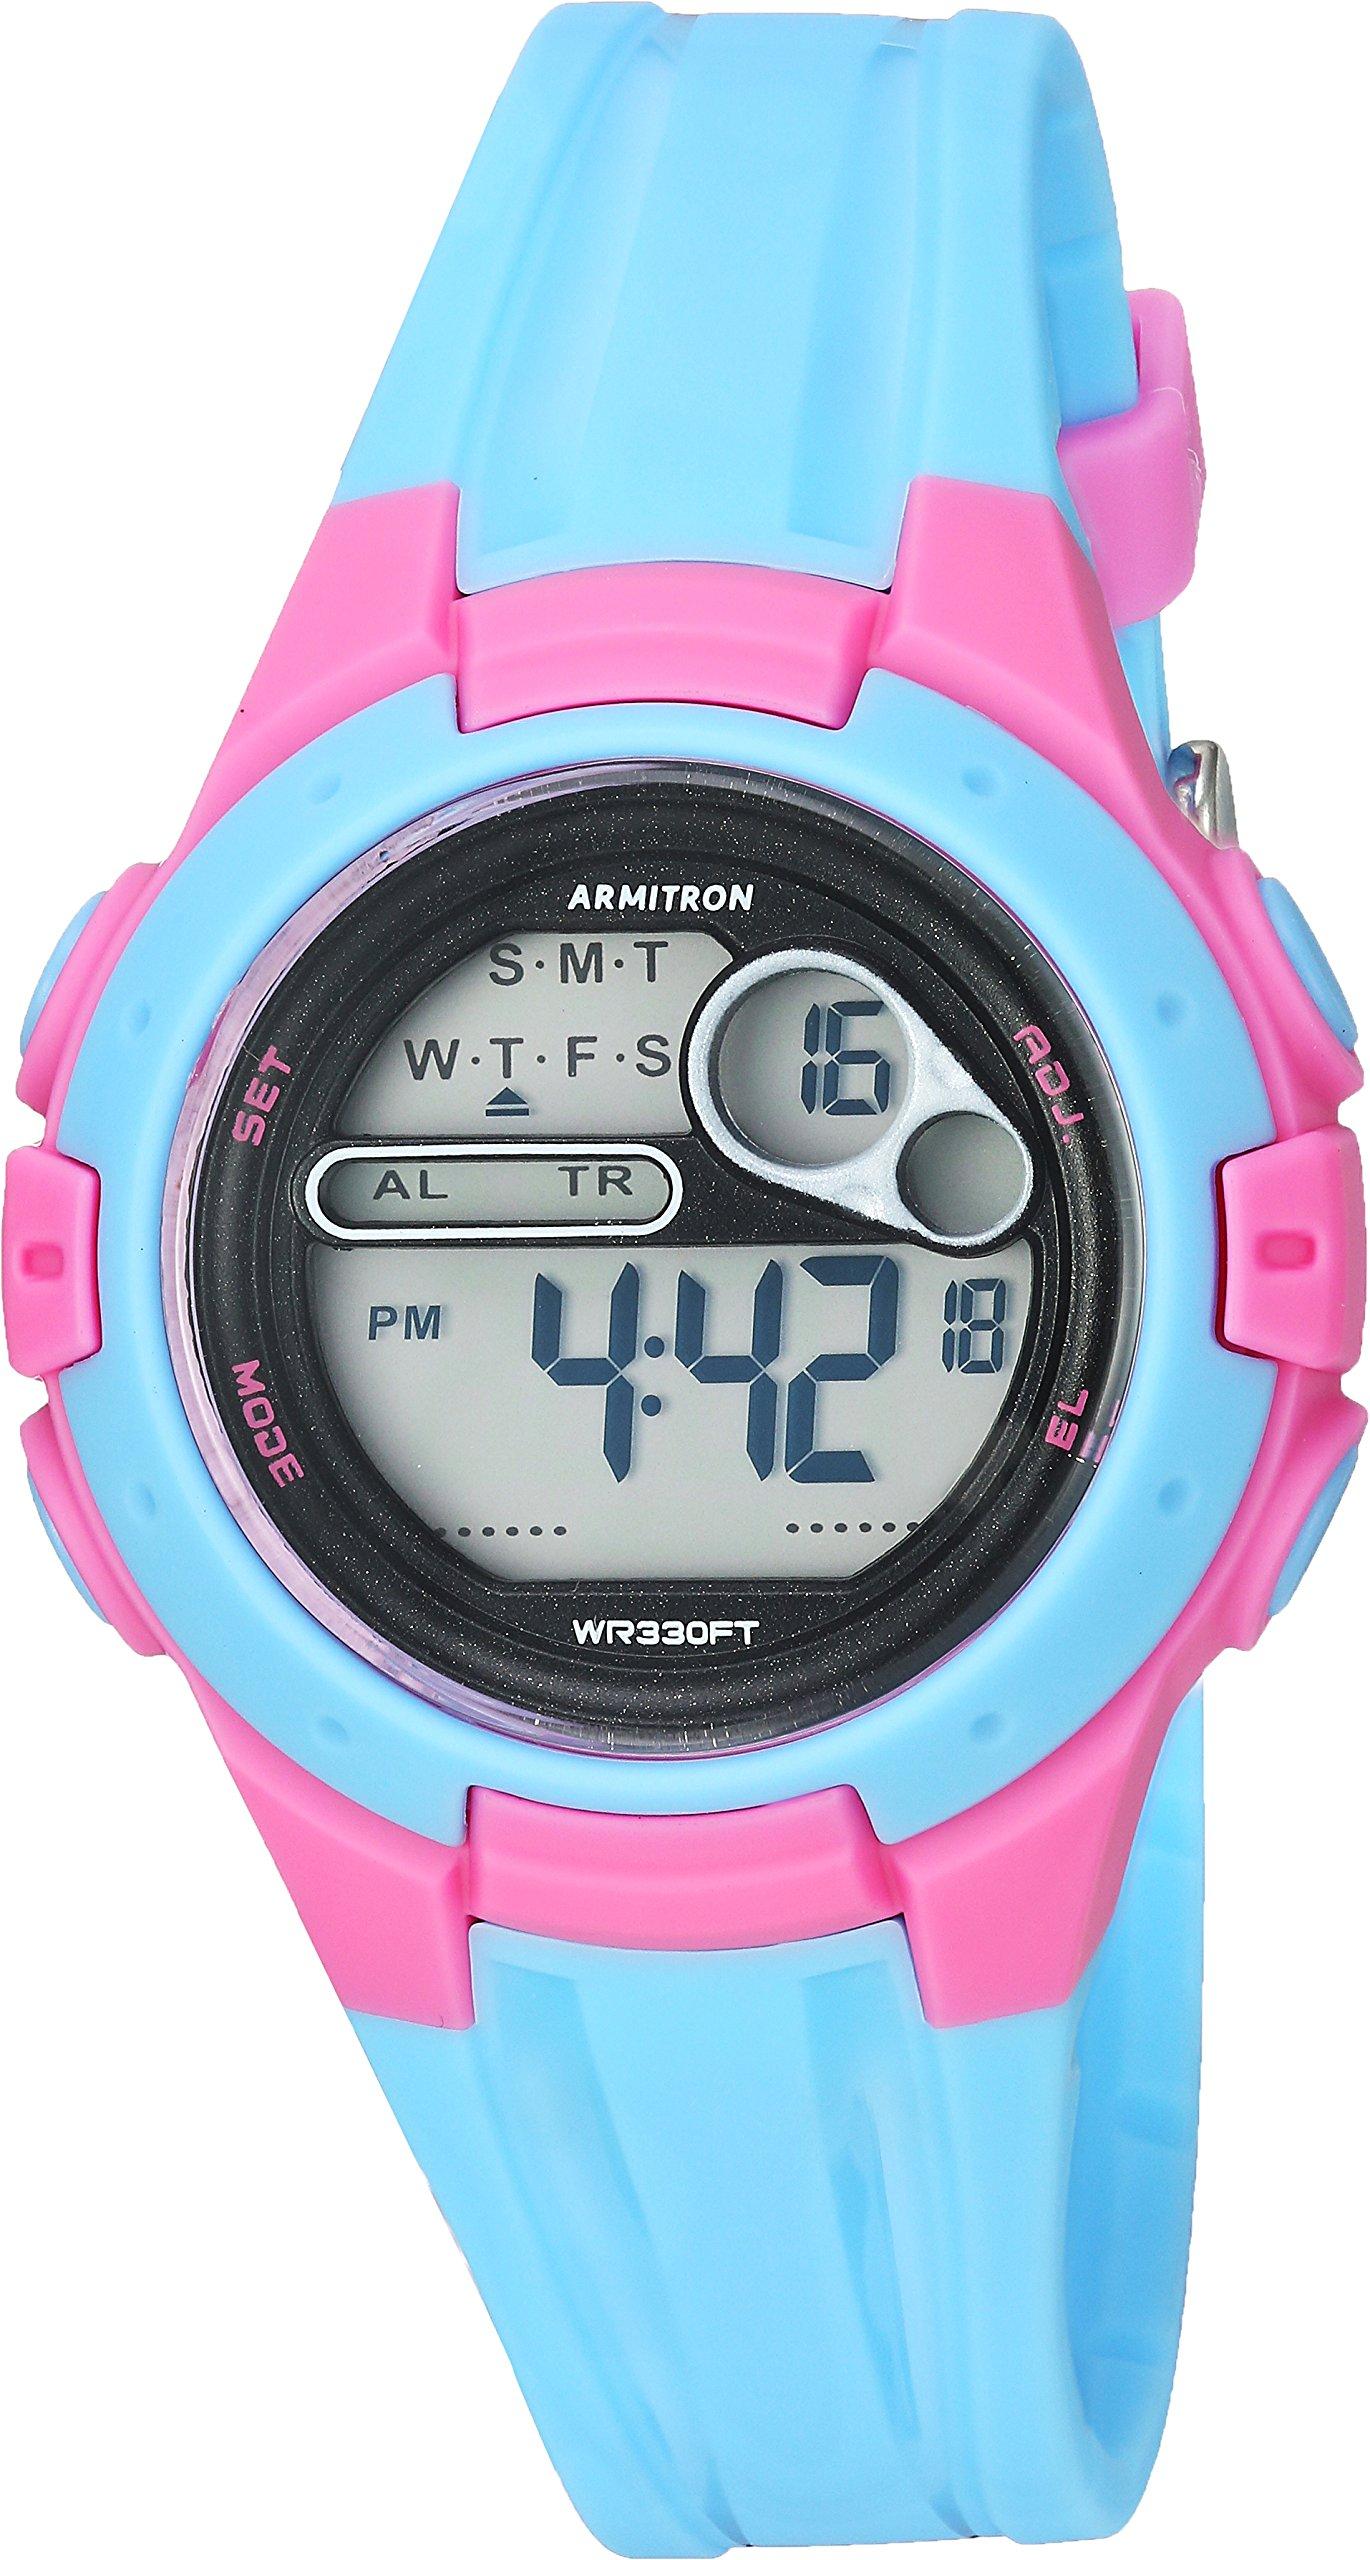 Armitron Sport Women's 45/7079LBL Pink Accented Digital Chronograph Light Blue Resin Strap Watch by Armitron Sport